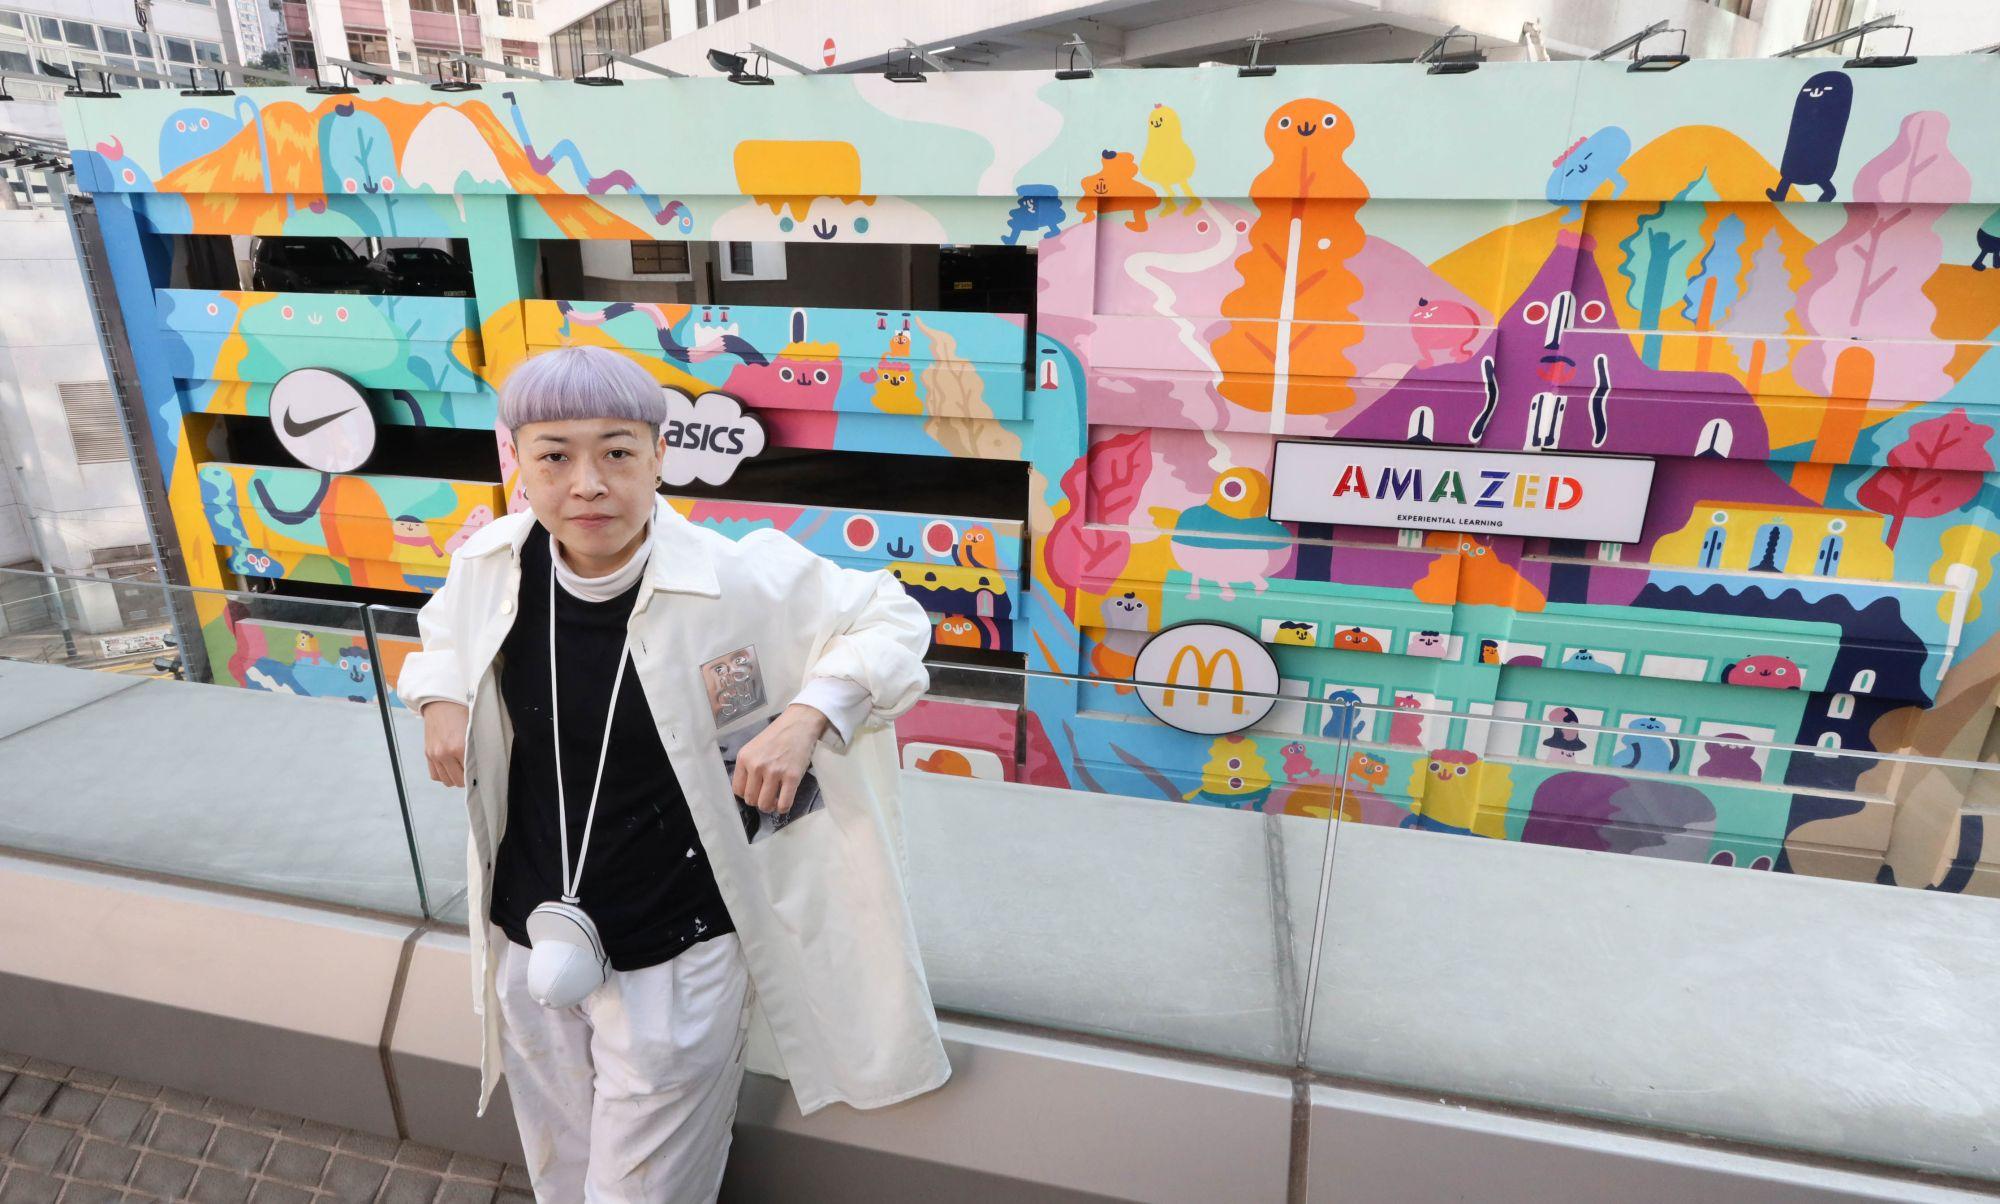 Hysan Mural Design Showcase Splashes Two Award-Winning Murals Across Causeway Bay